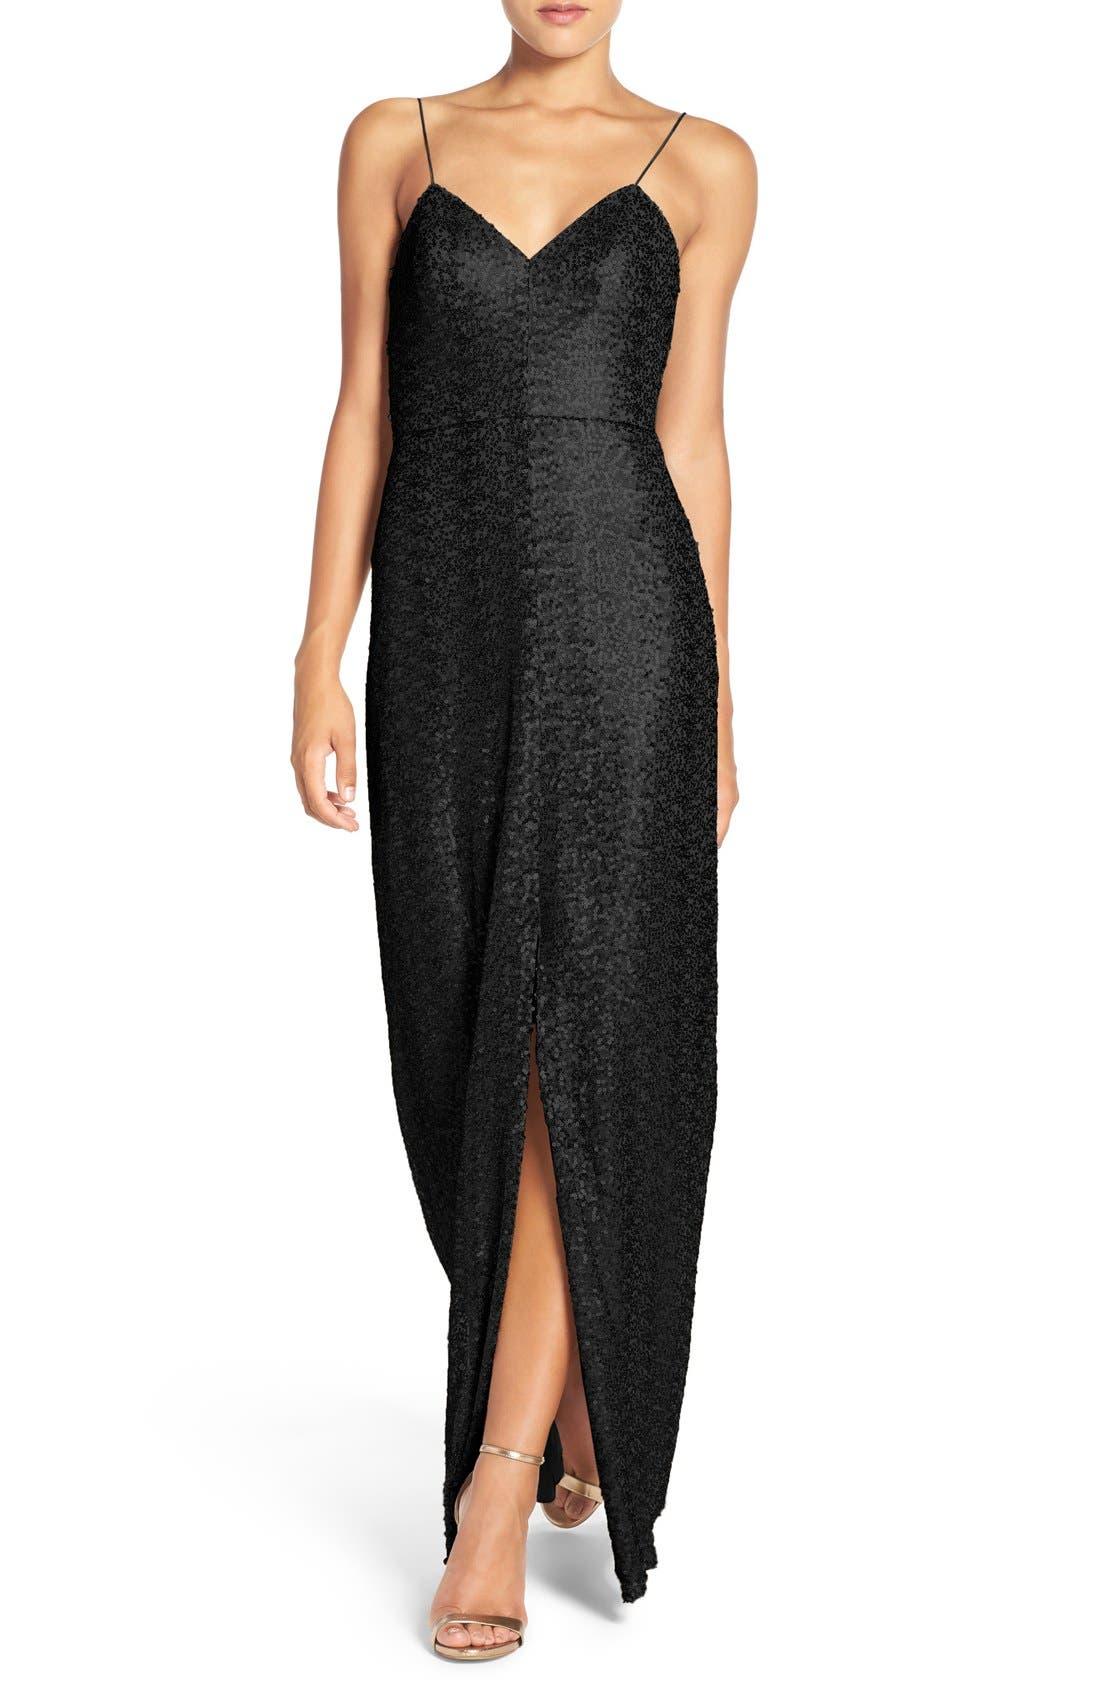 Amsale 'Samantha' Spaghetti Strap V-Neck Sequin Gown